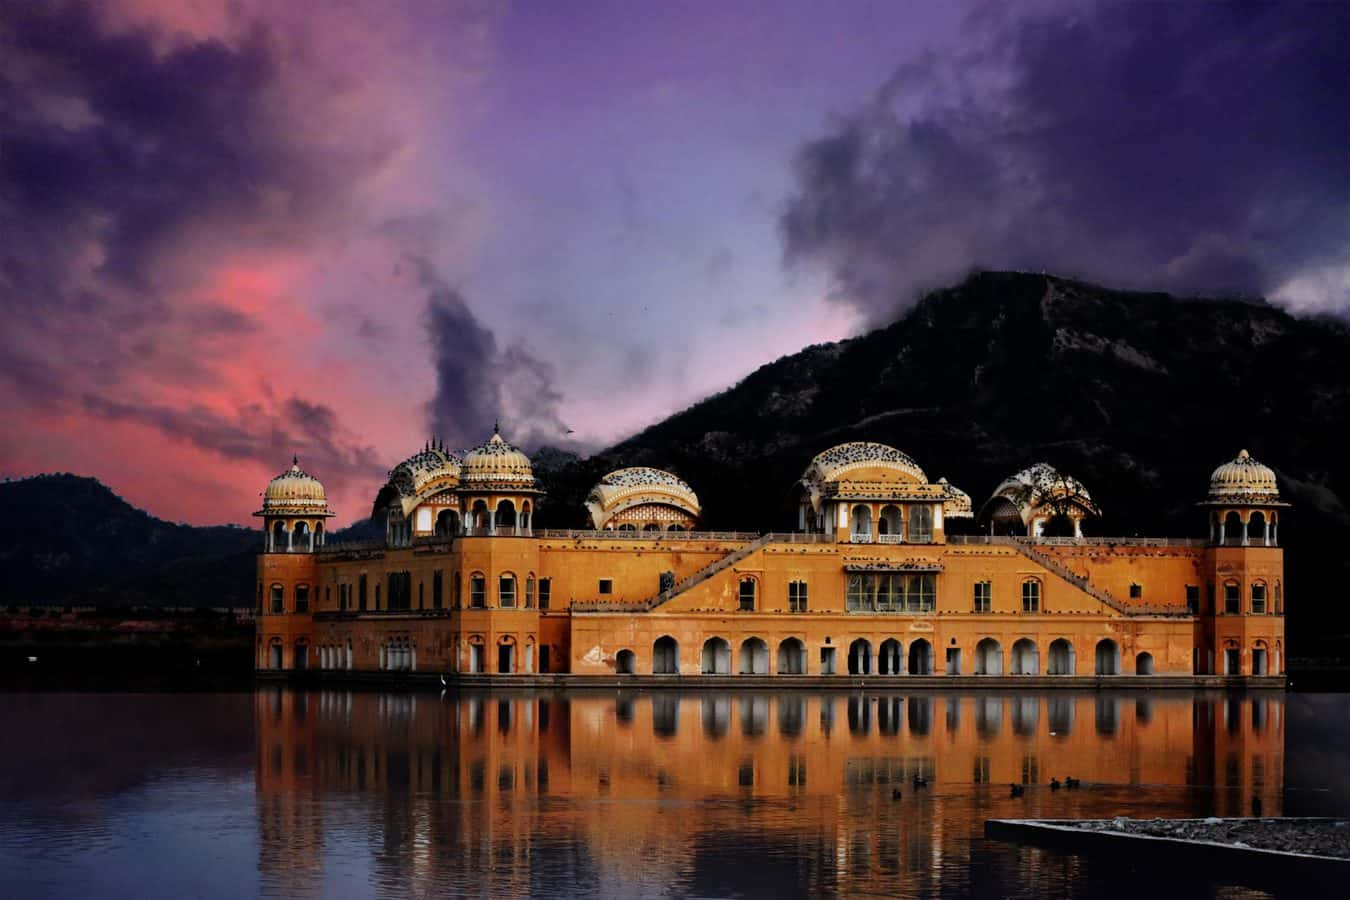 The Floating Palace Jal Mahal at dusk with cloudy skies. Curtesy of Ravi Shekhar via unsplash - Open copyright